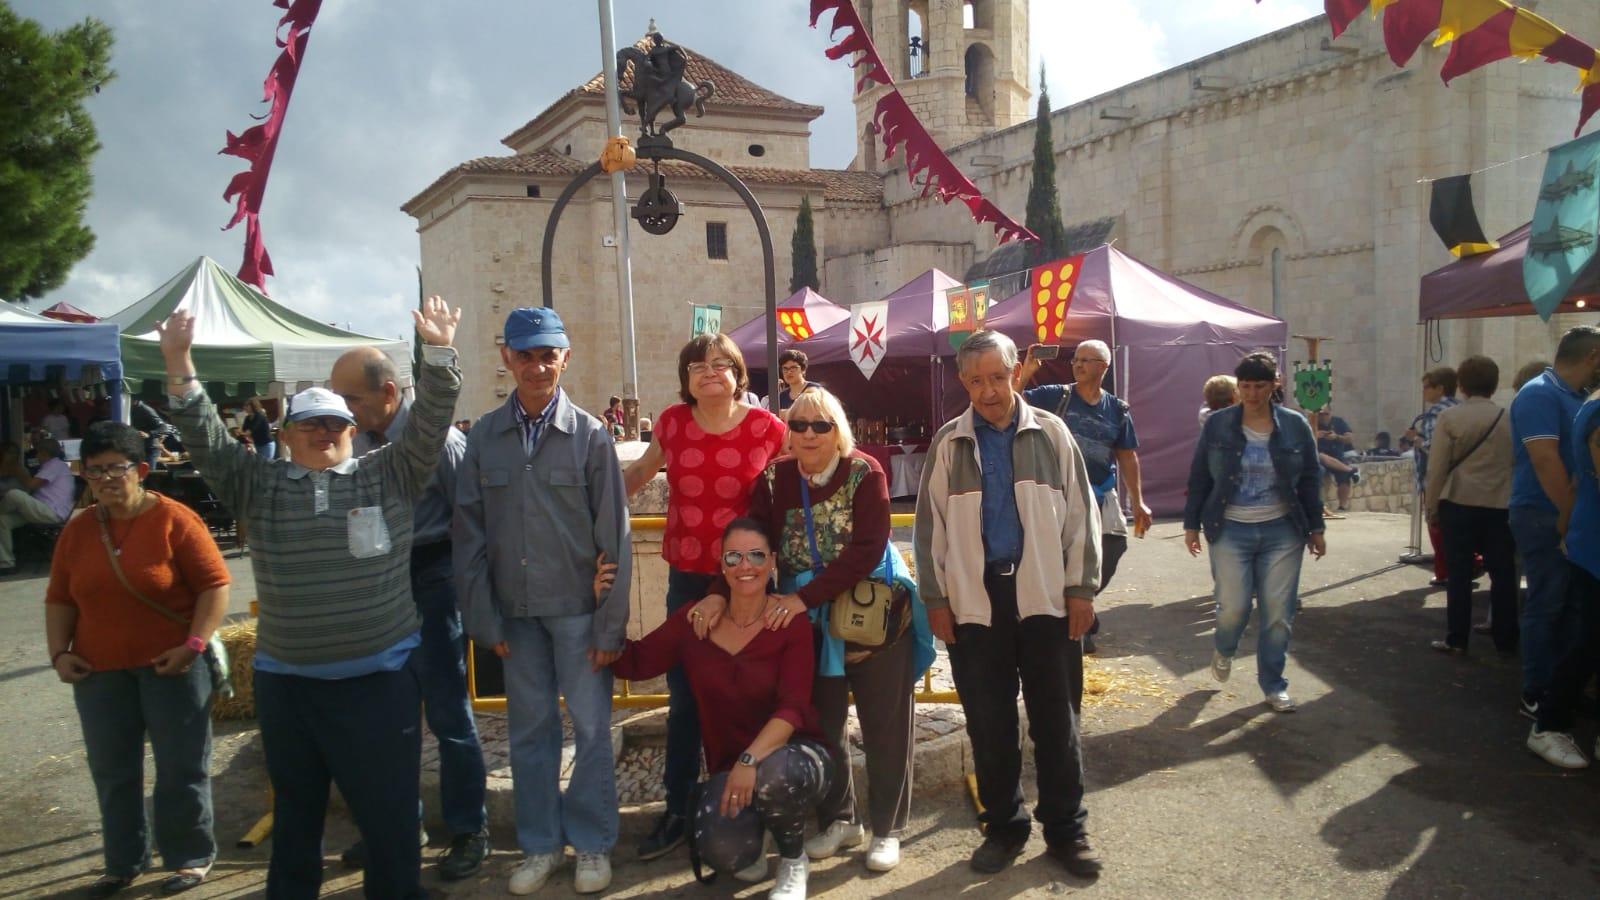 La llar visita la Fira Medieval de Sant Martí Sarroca